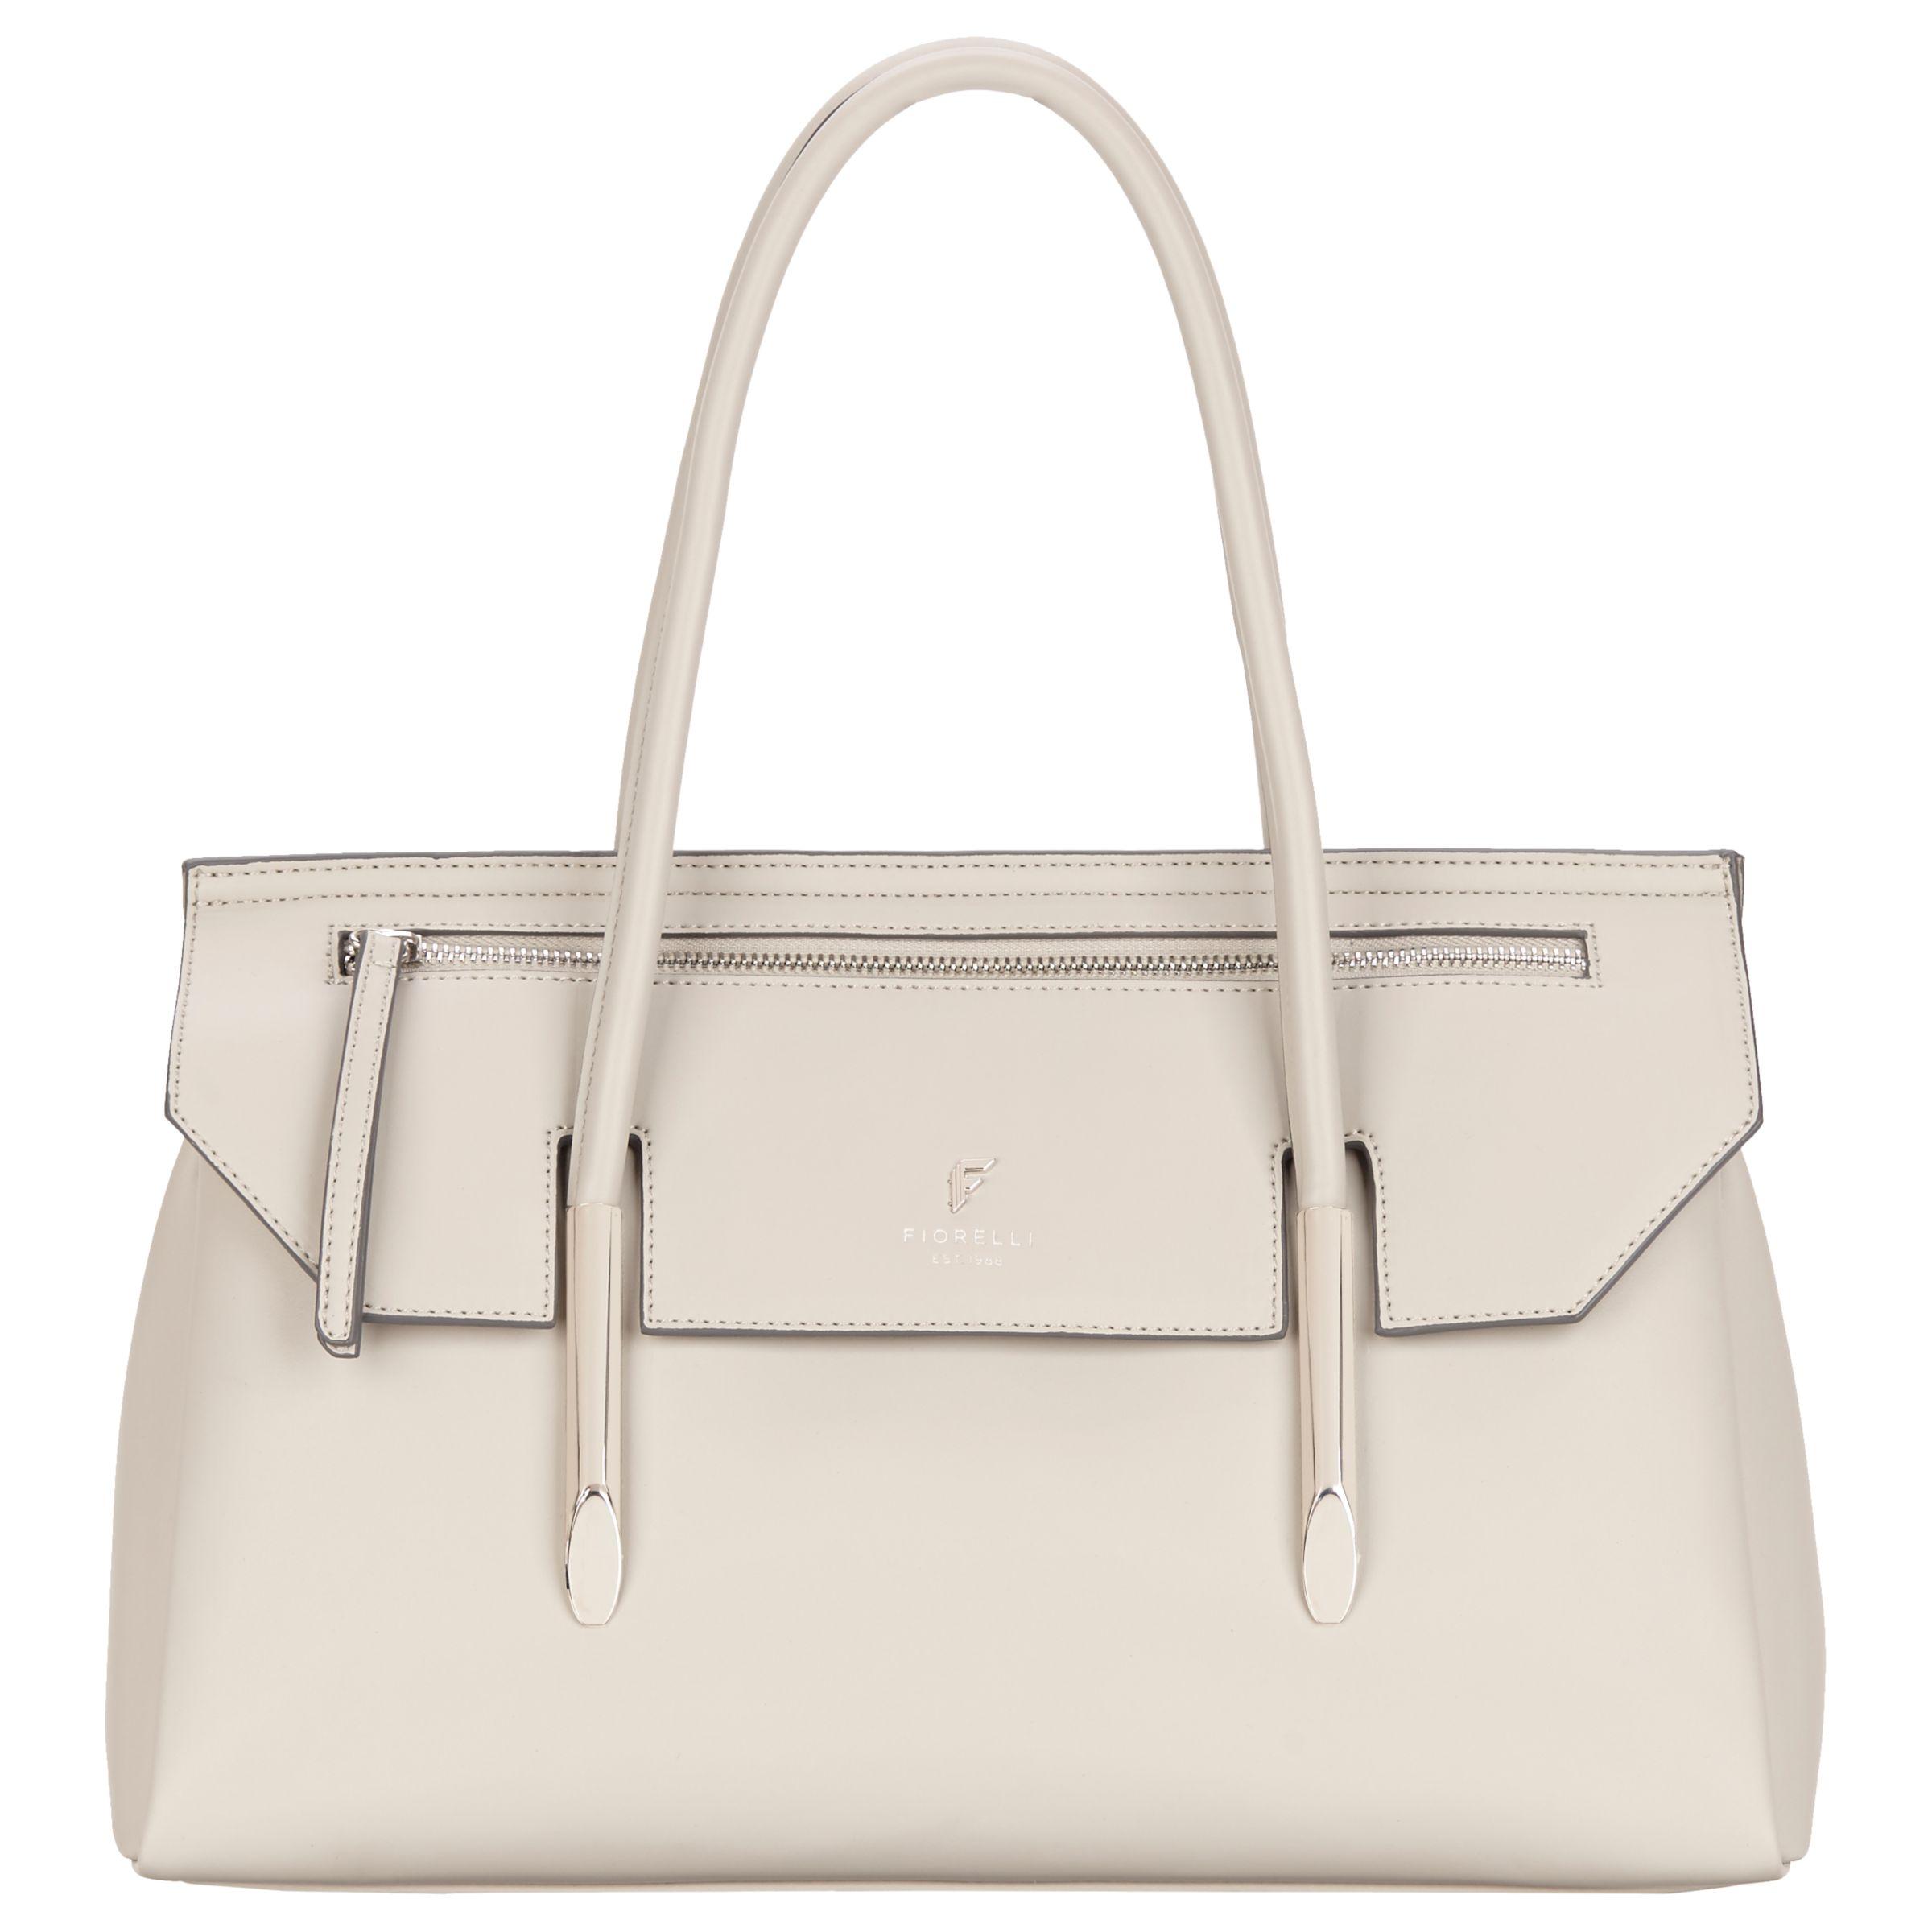 Fiorelli Fiorelli Carlton Flap-Over East West Tote Bag, Misty Grey